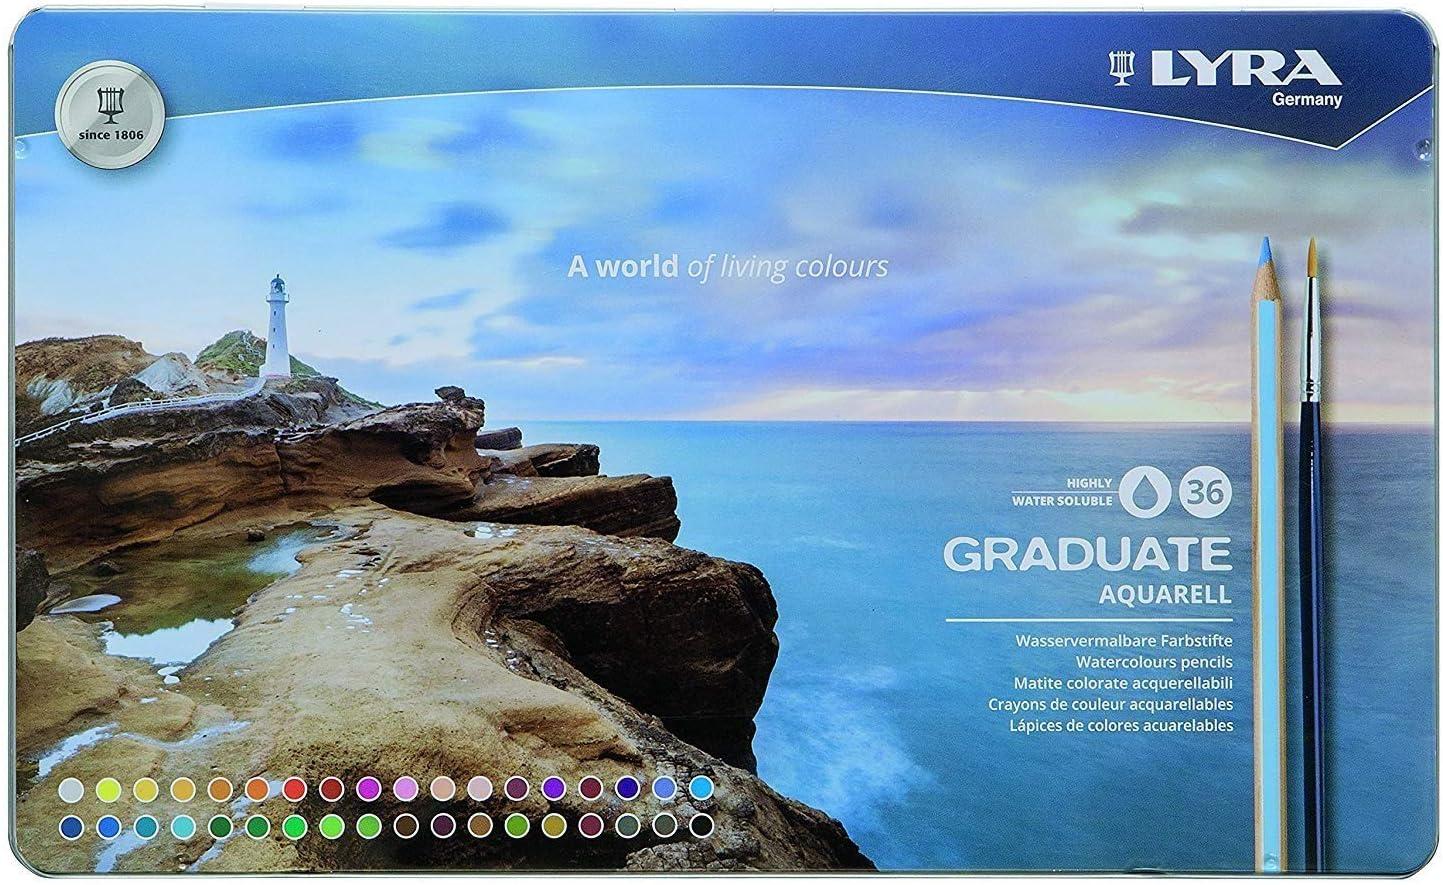 Lyra Graduate Aquarell Colored Pencil Set, Assorted Colors, Set of 36 (2881360)